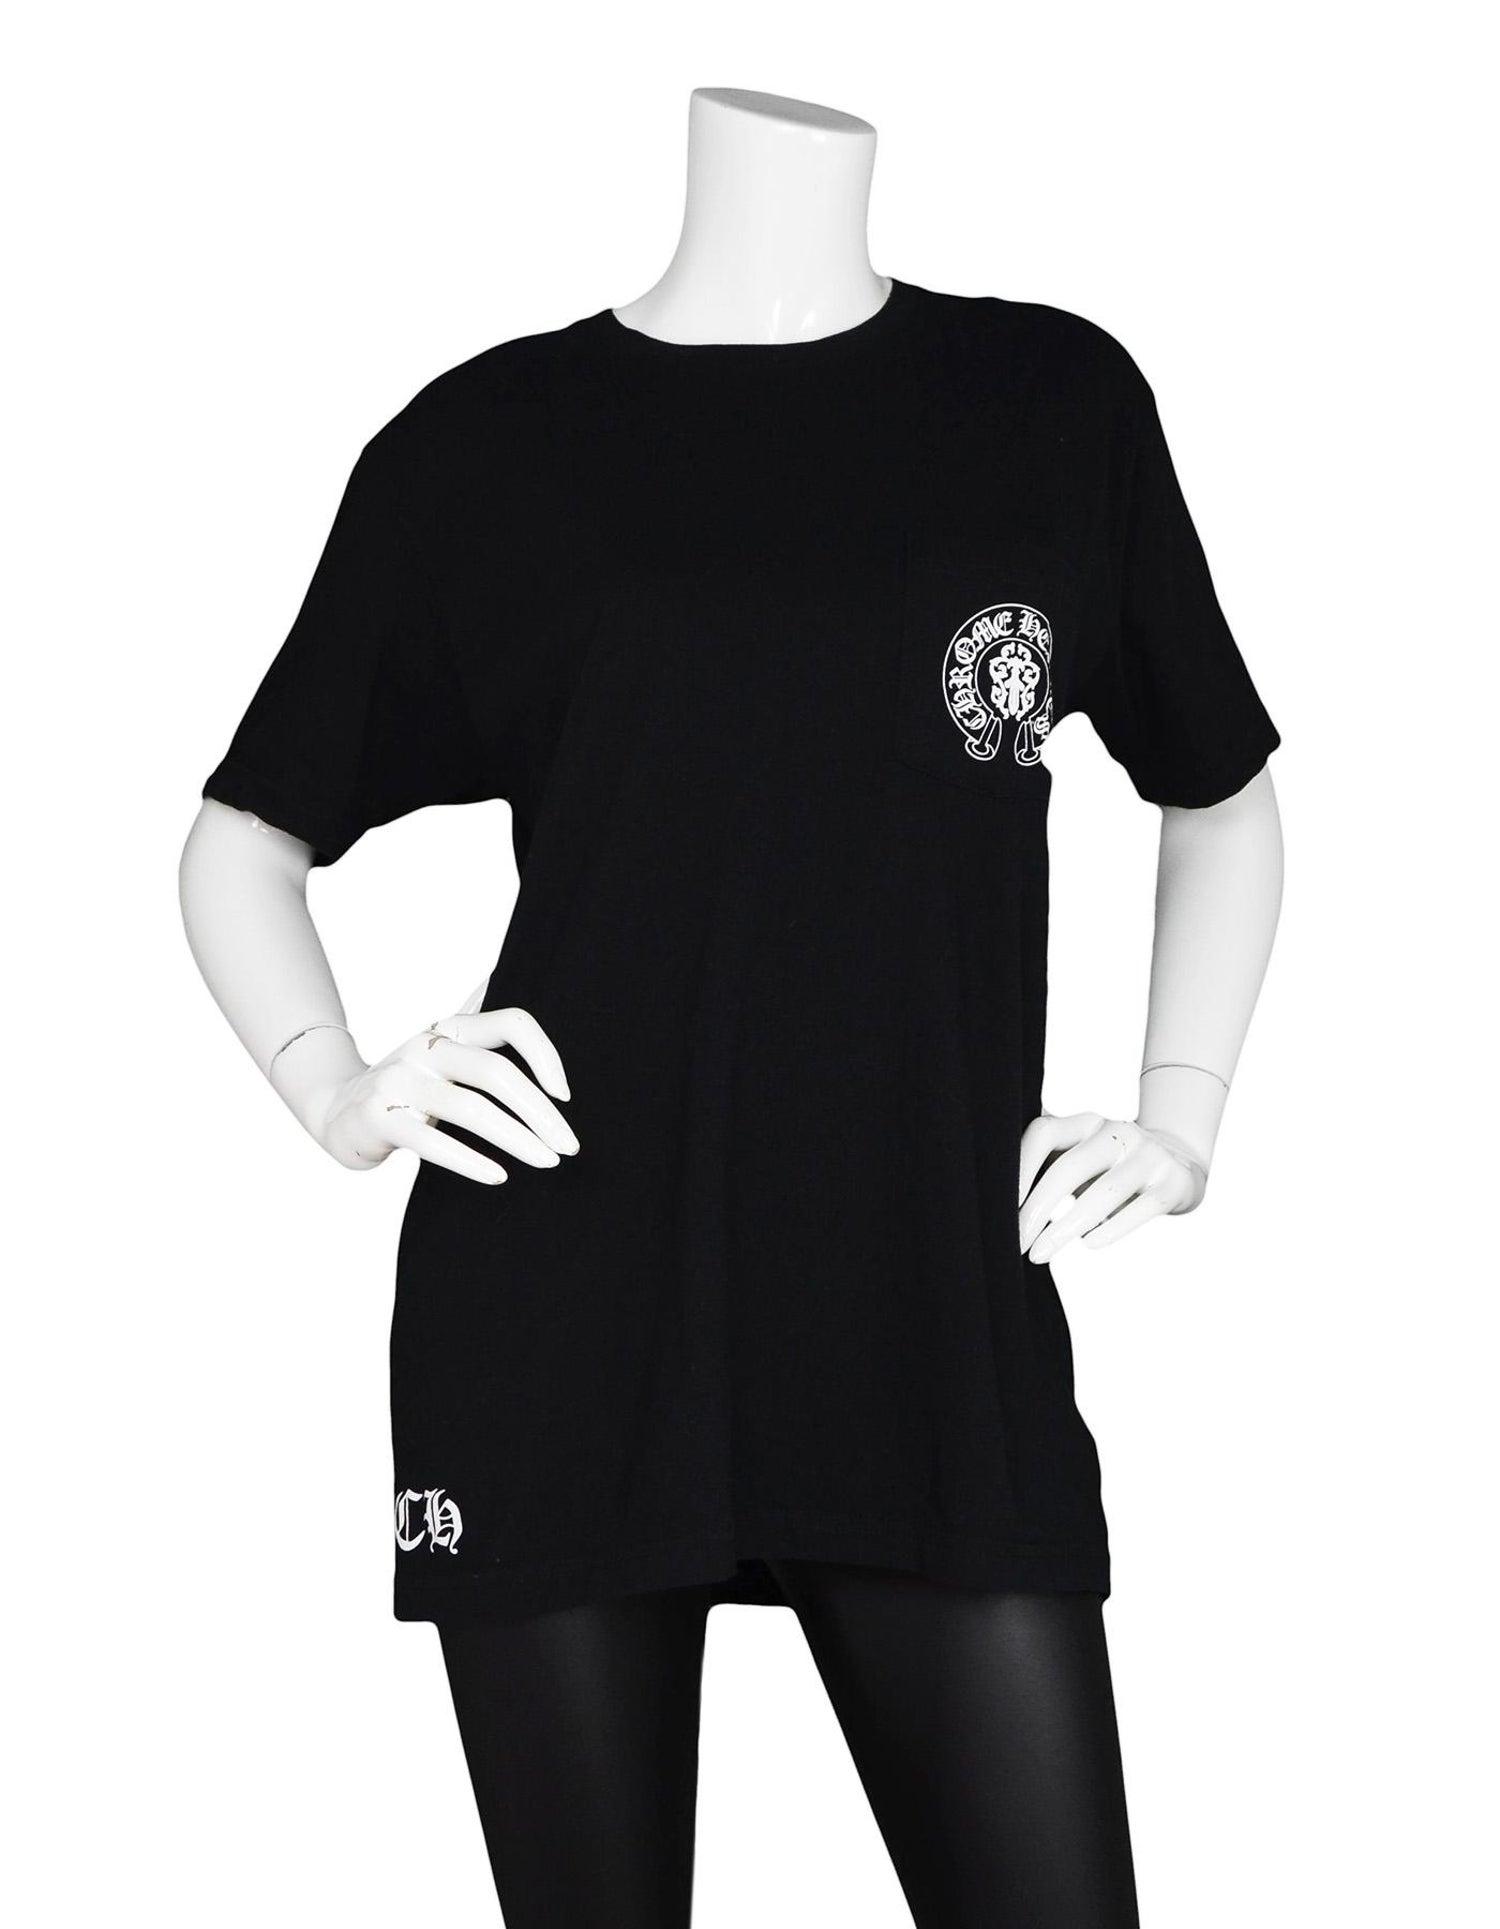 8dd47087c489 Chrome Hearts Men s Black Flag American Flag Cotton Pocket Short Sleeve  T-Shirt For Sale at 1stdibs